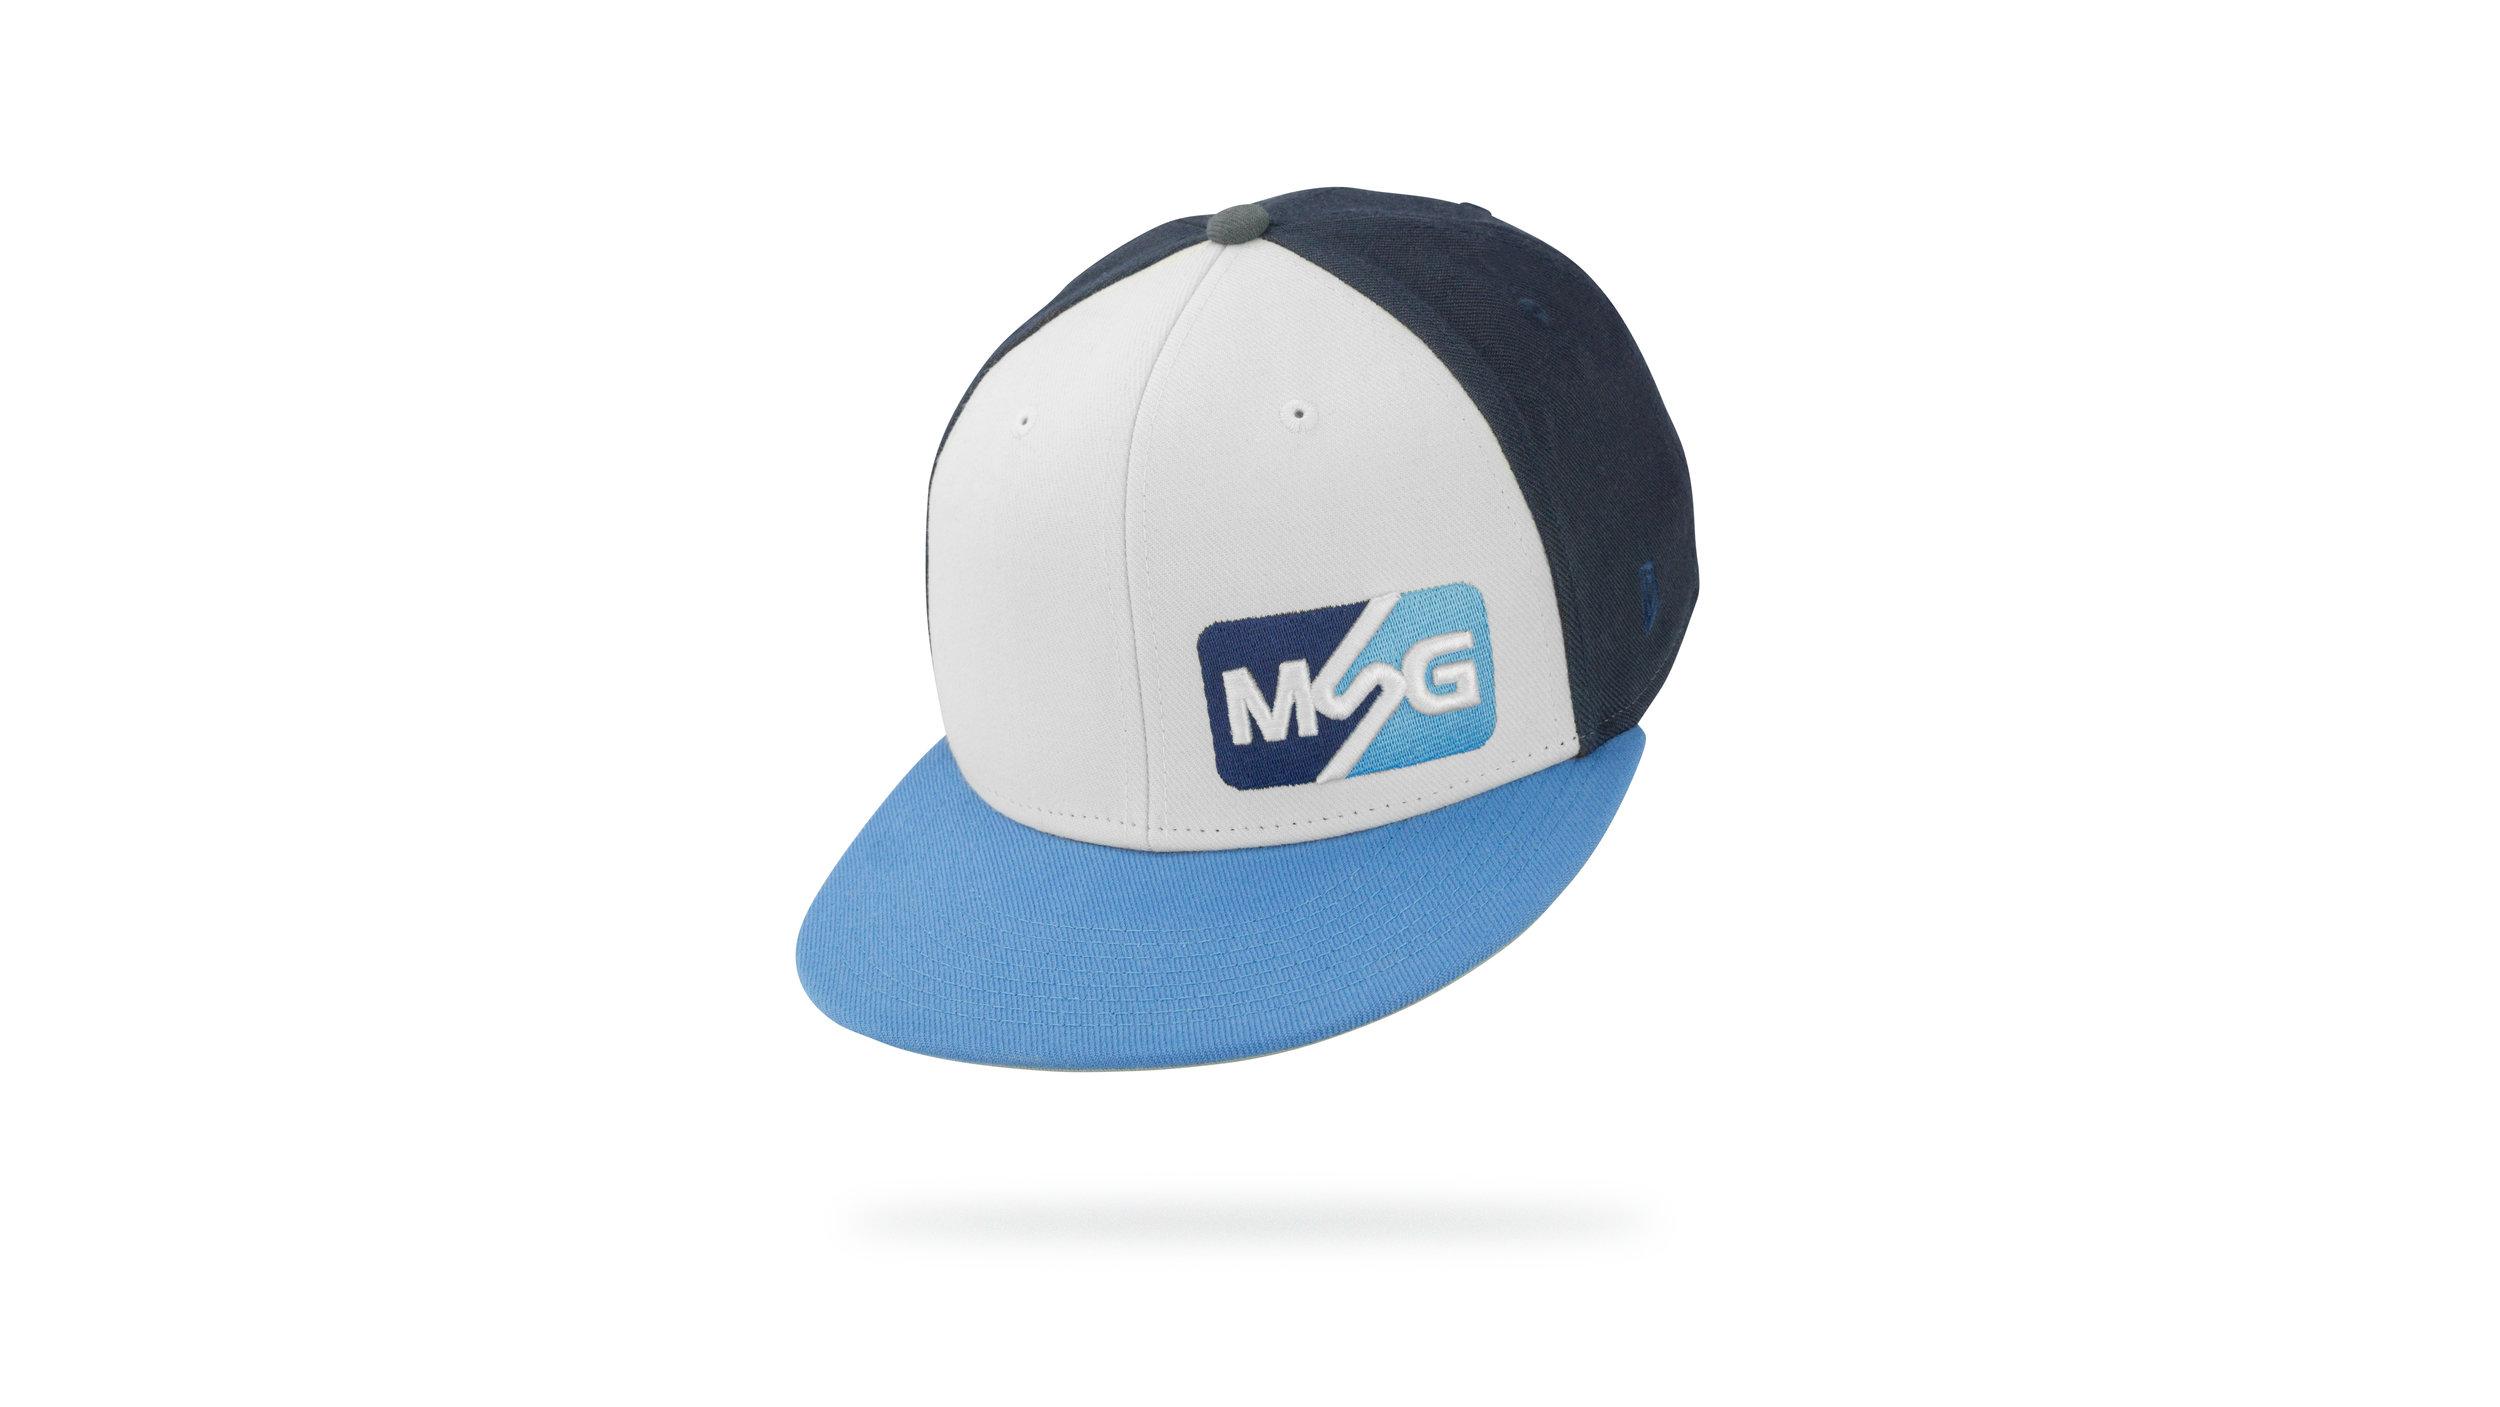 Featured Hat:STYLE VIII - Hybrid Wool Blend SnapBack Cap w/ Flat Visor & 3D Embroidery